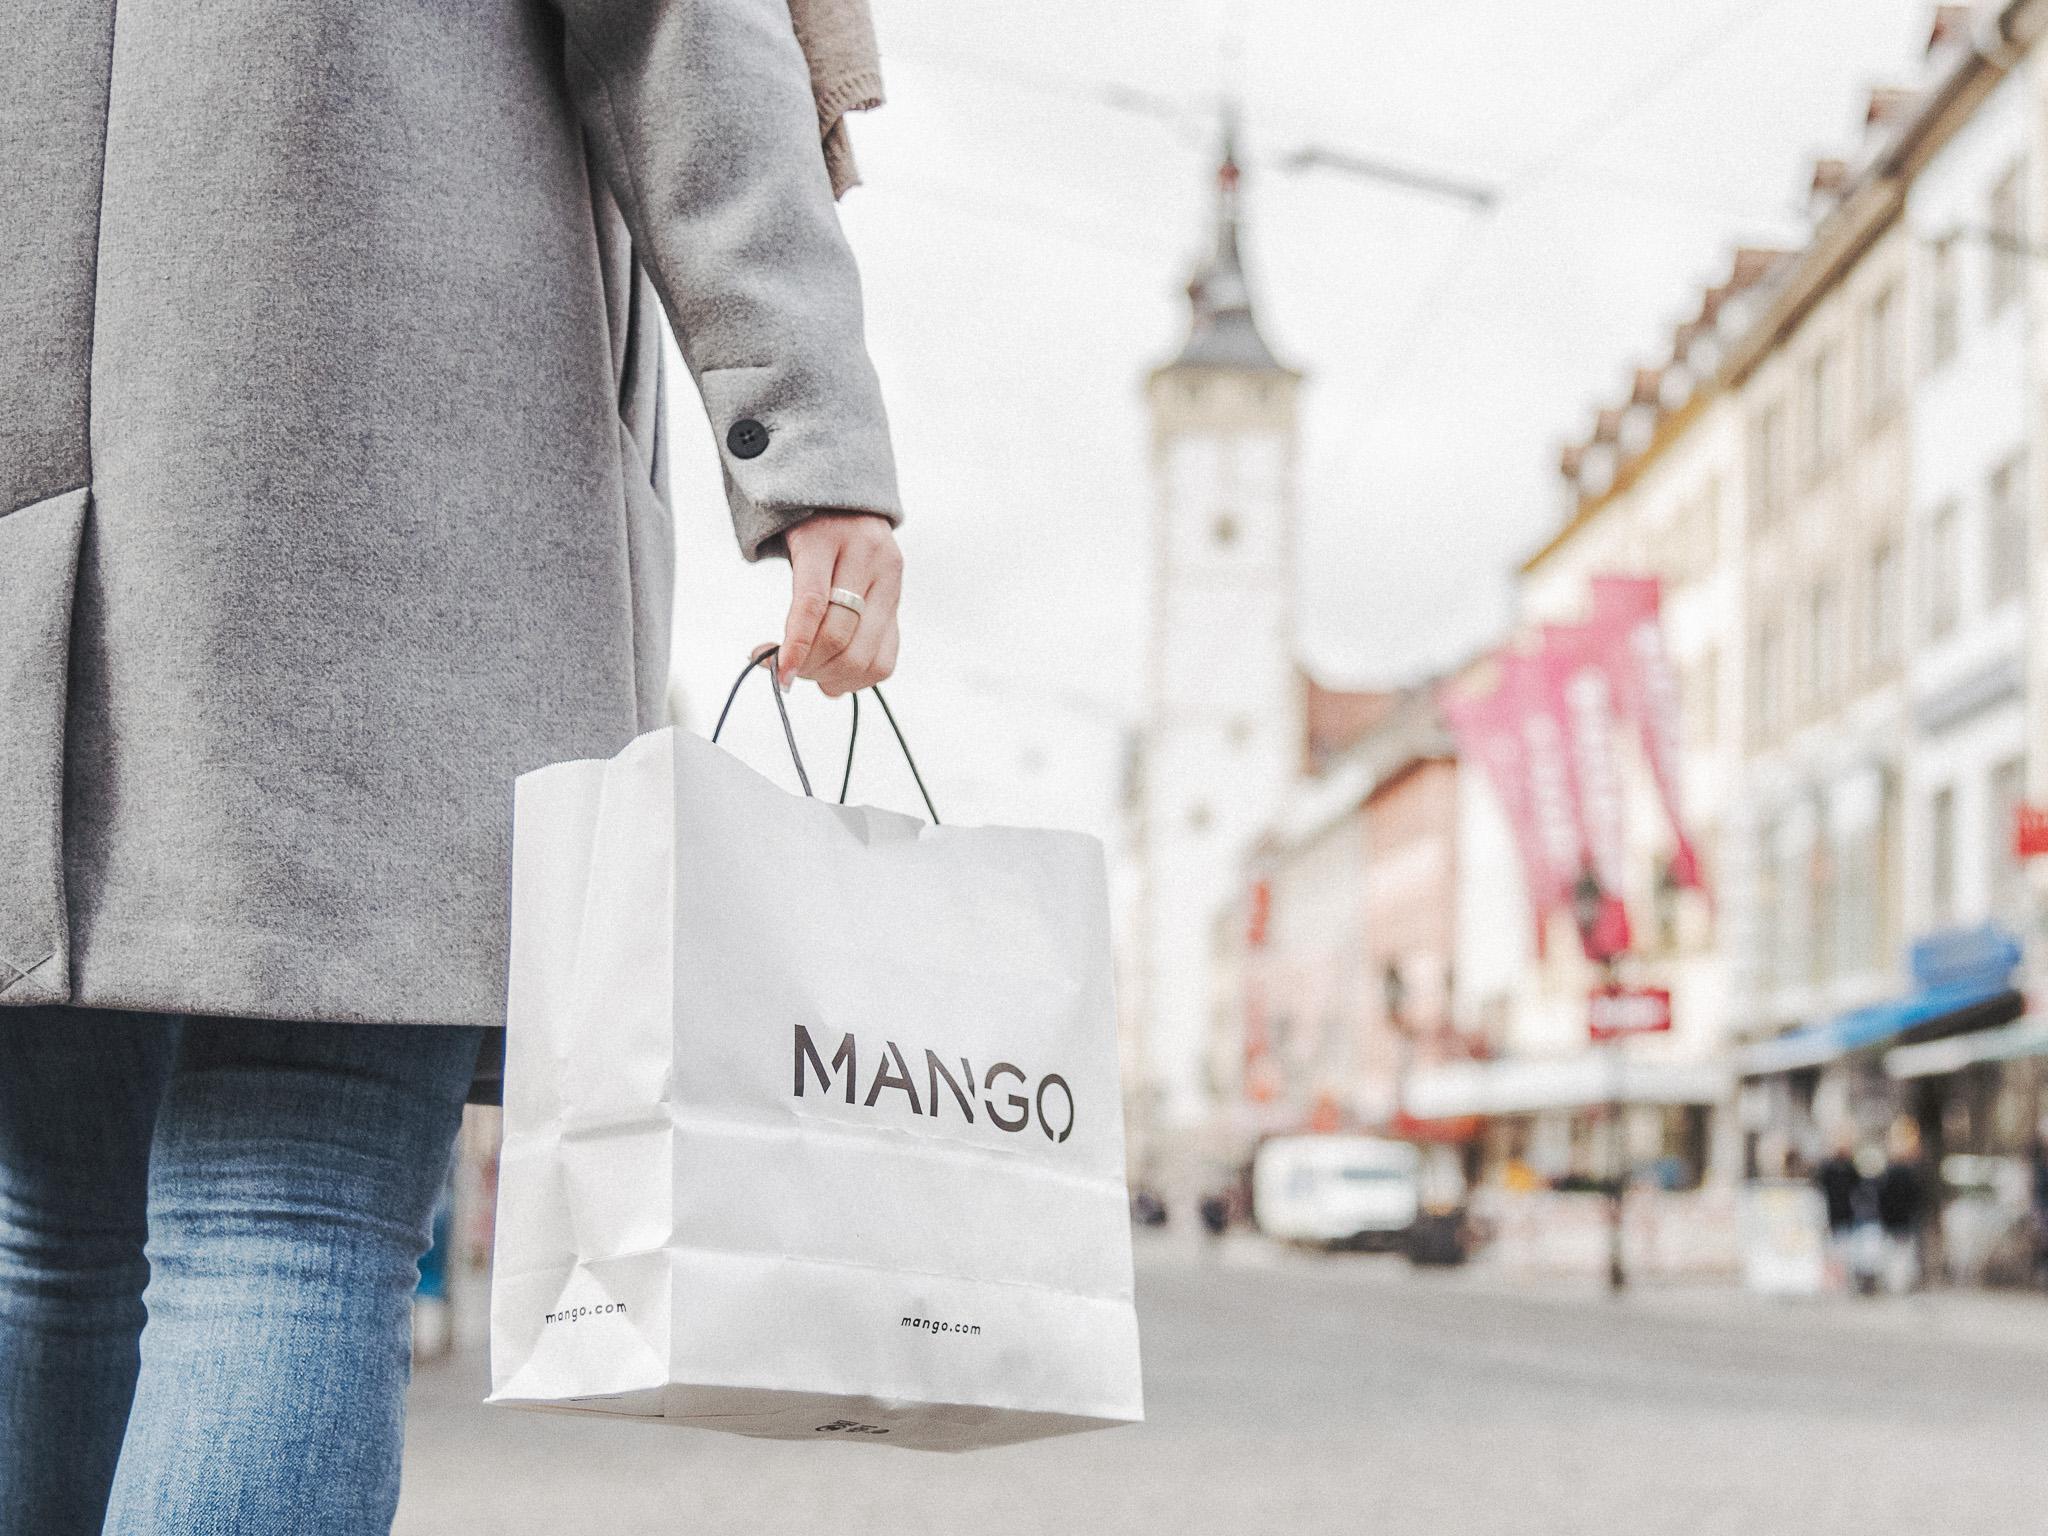 Mango in Würzburg. Symbolfoto: Pascal Höfig